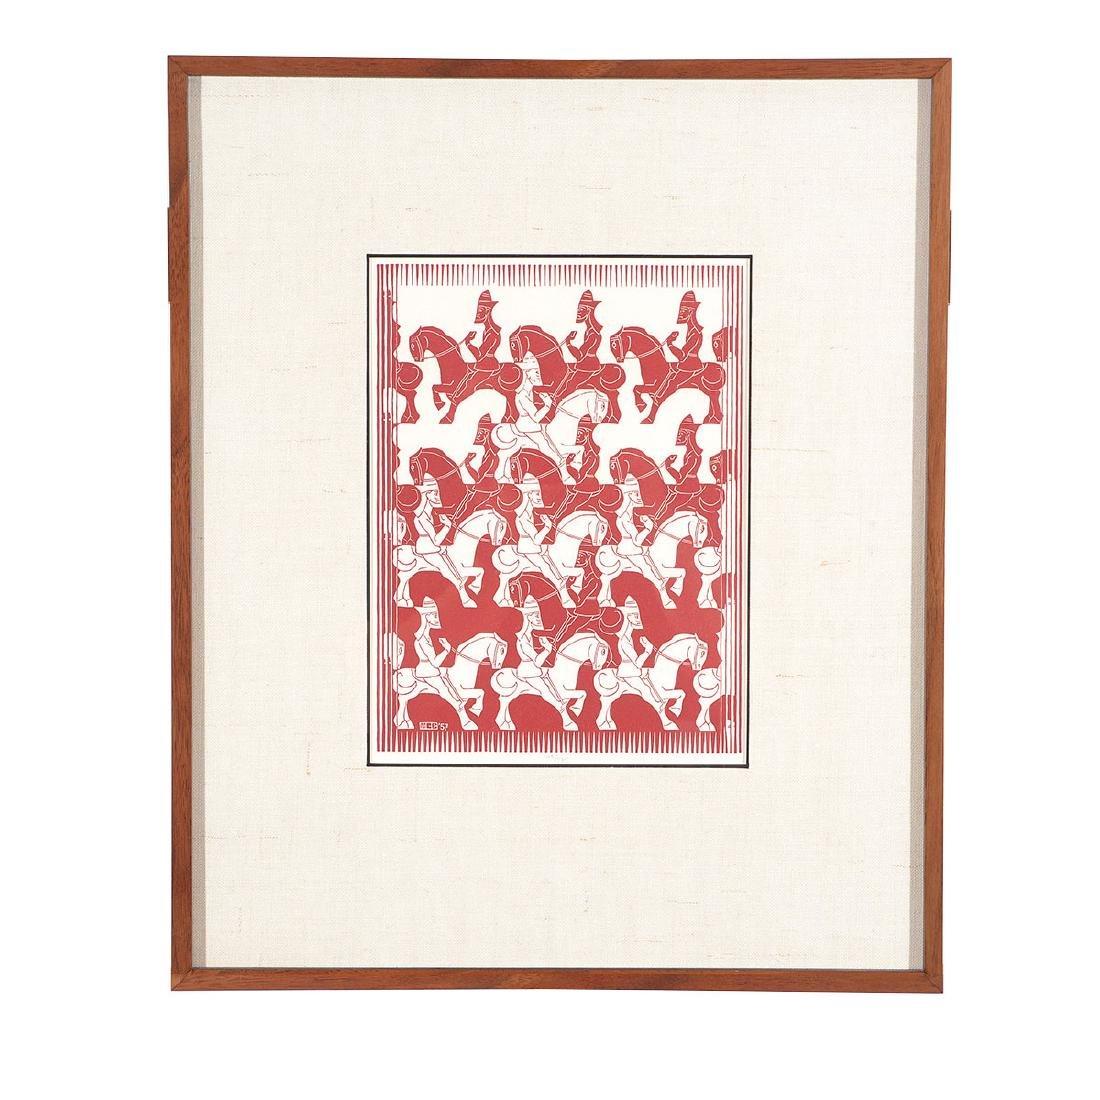 "Escher, 2 ""Regular Division of the Plane III"" woodcuts - 10"